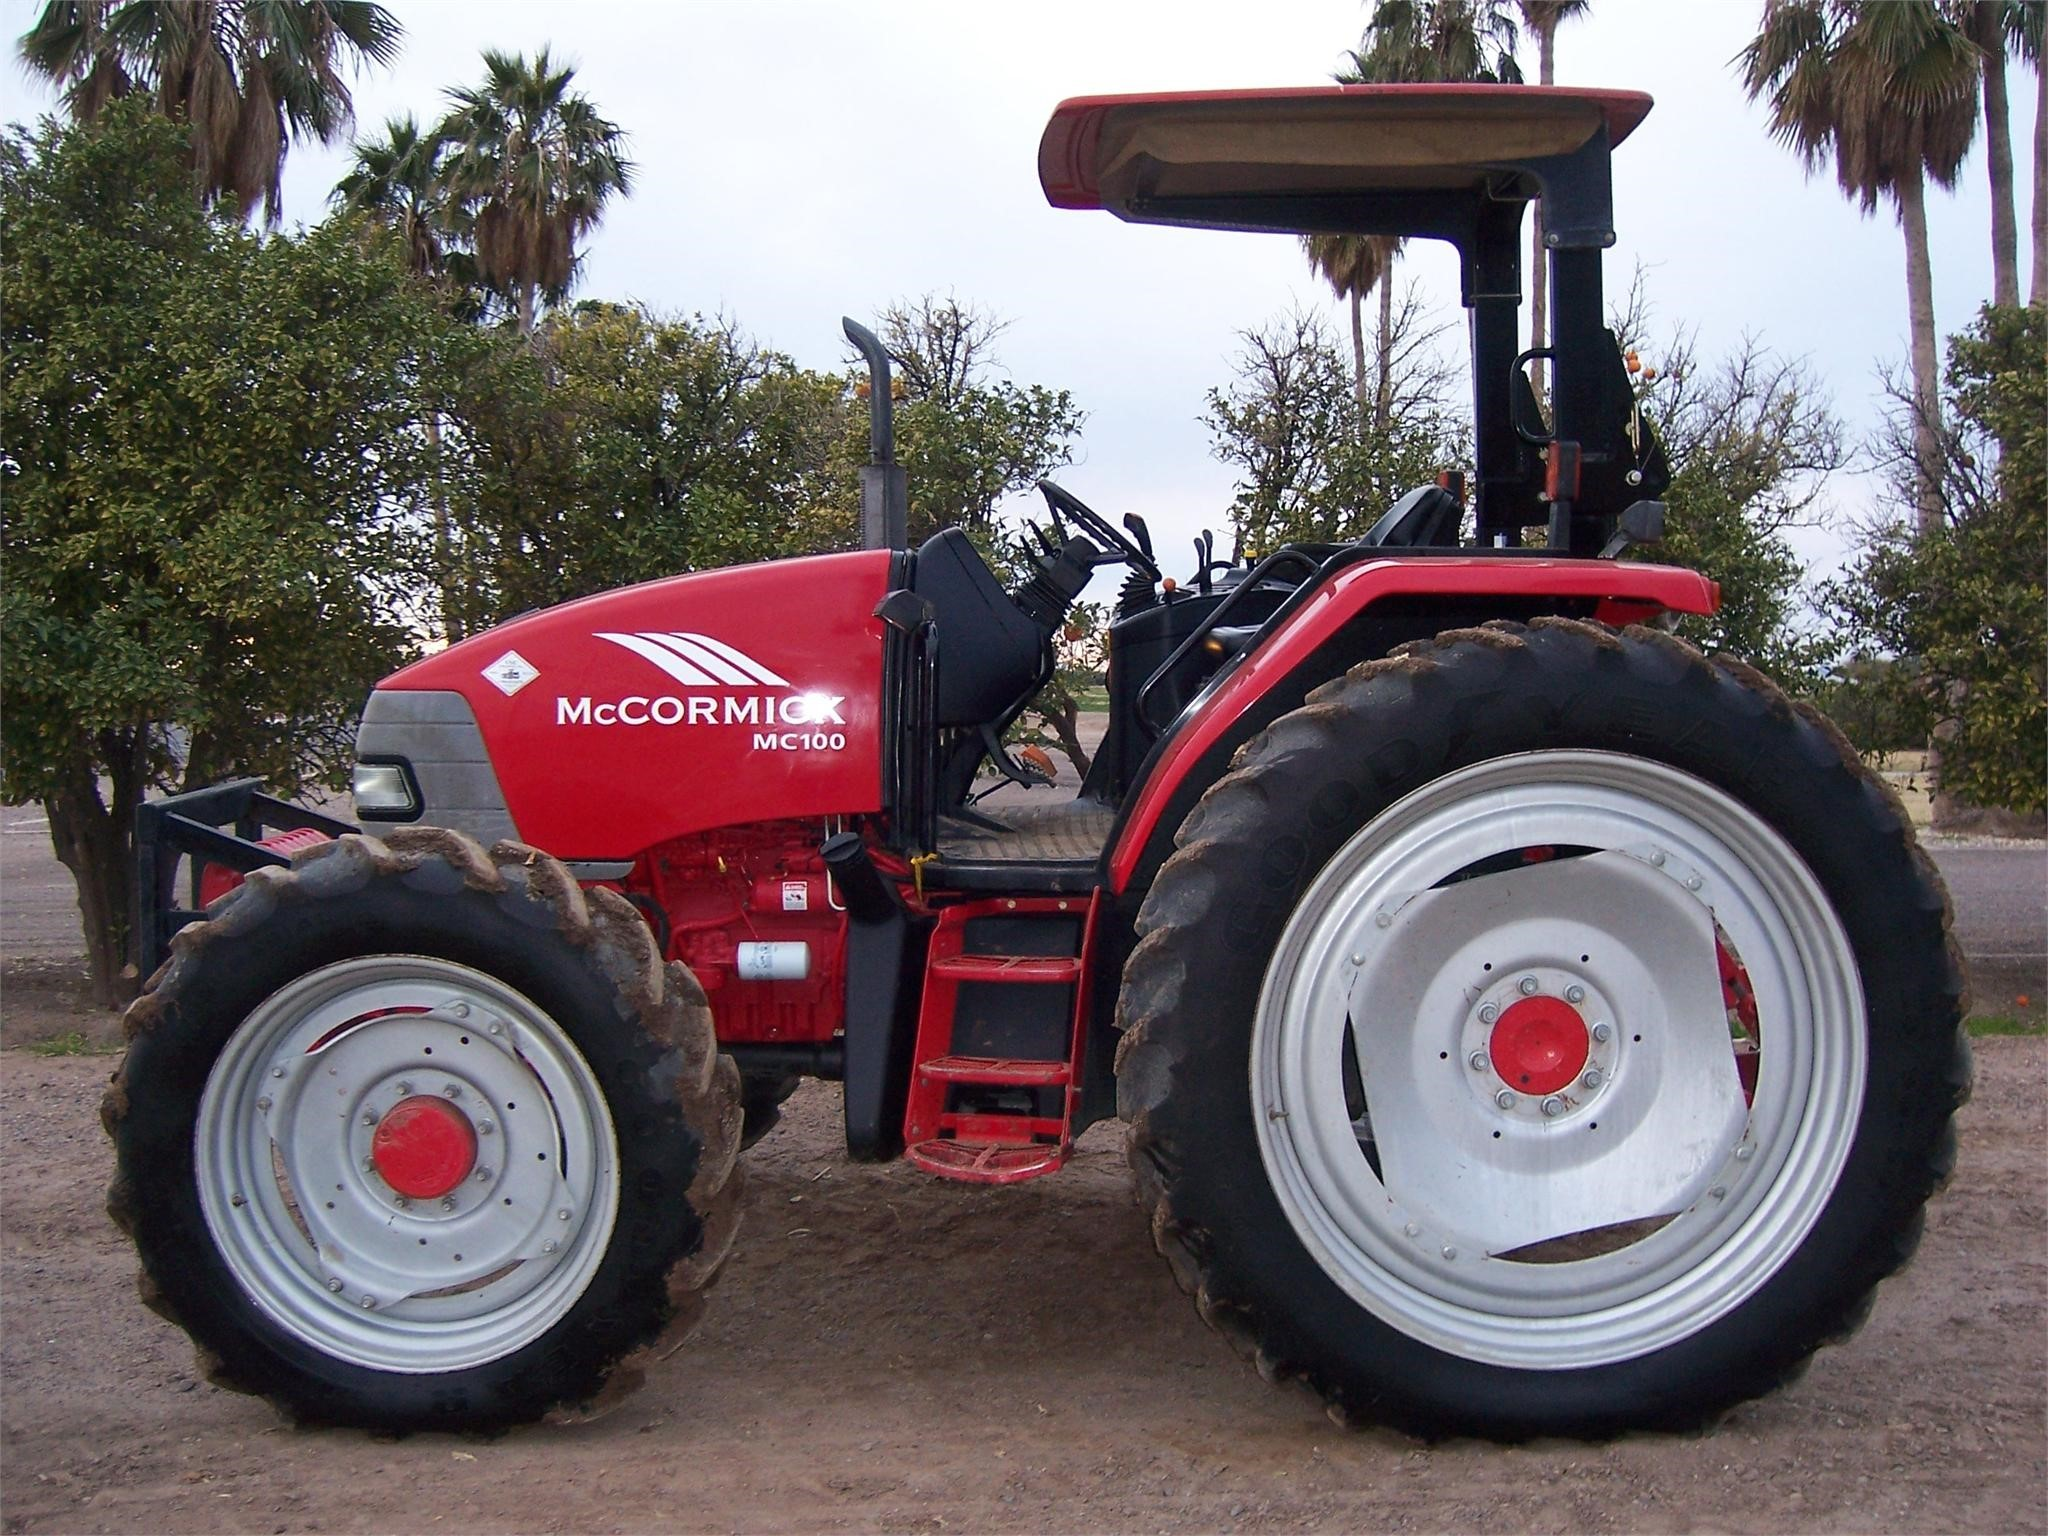 2003 McCormick MC100 Tractor